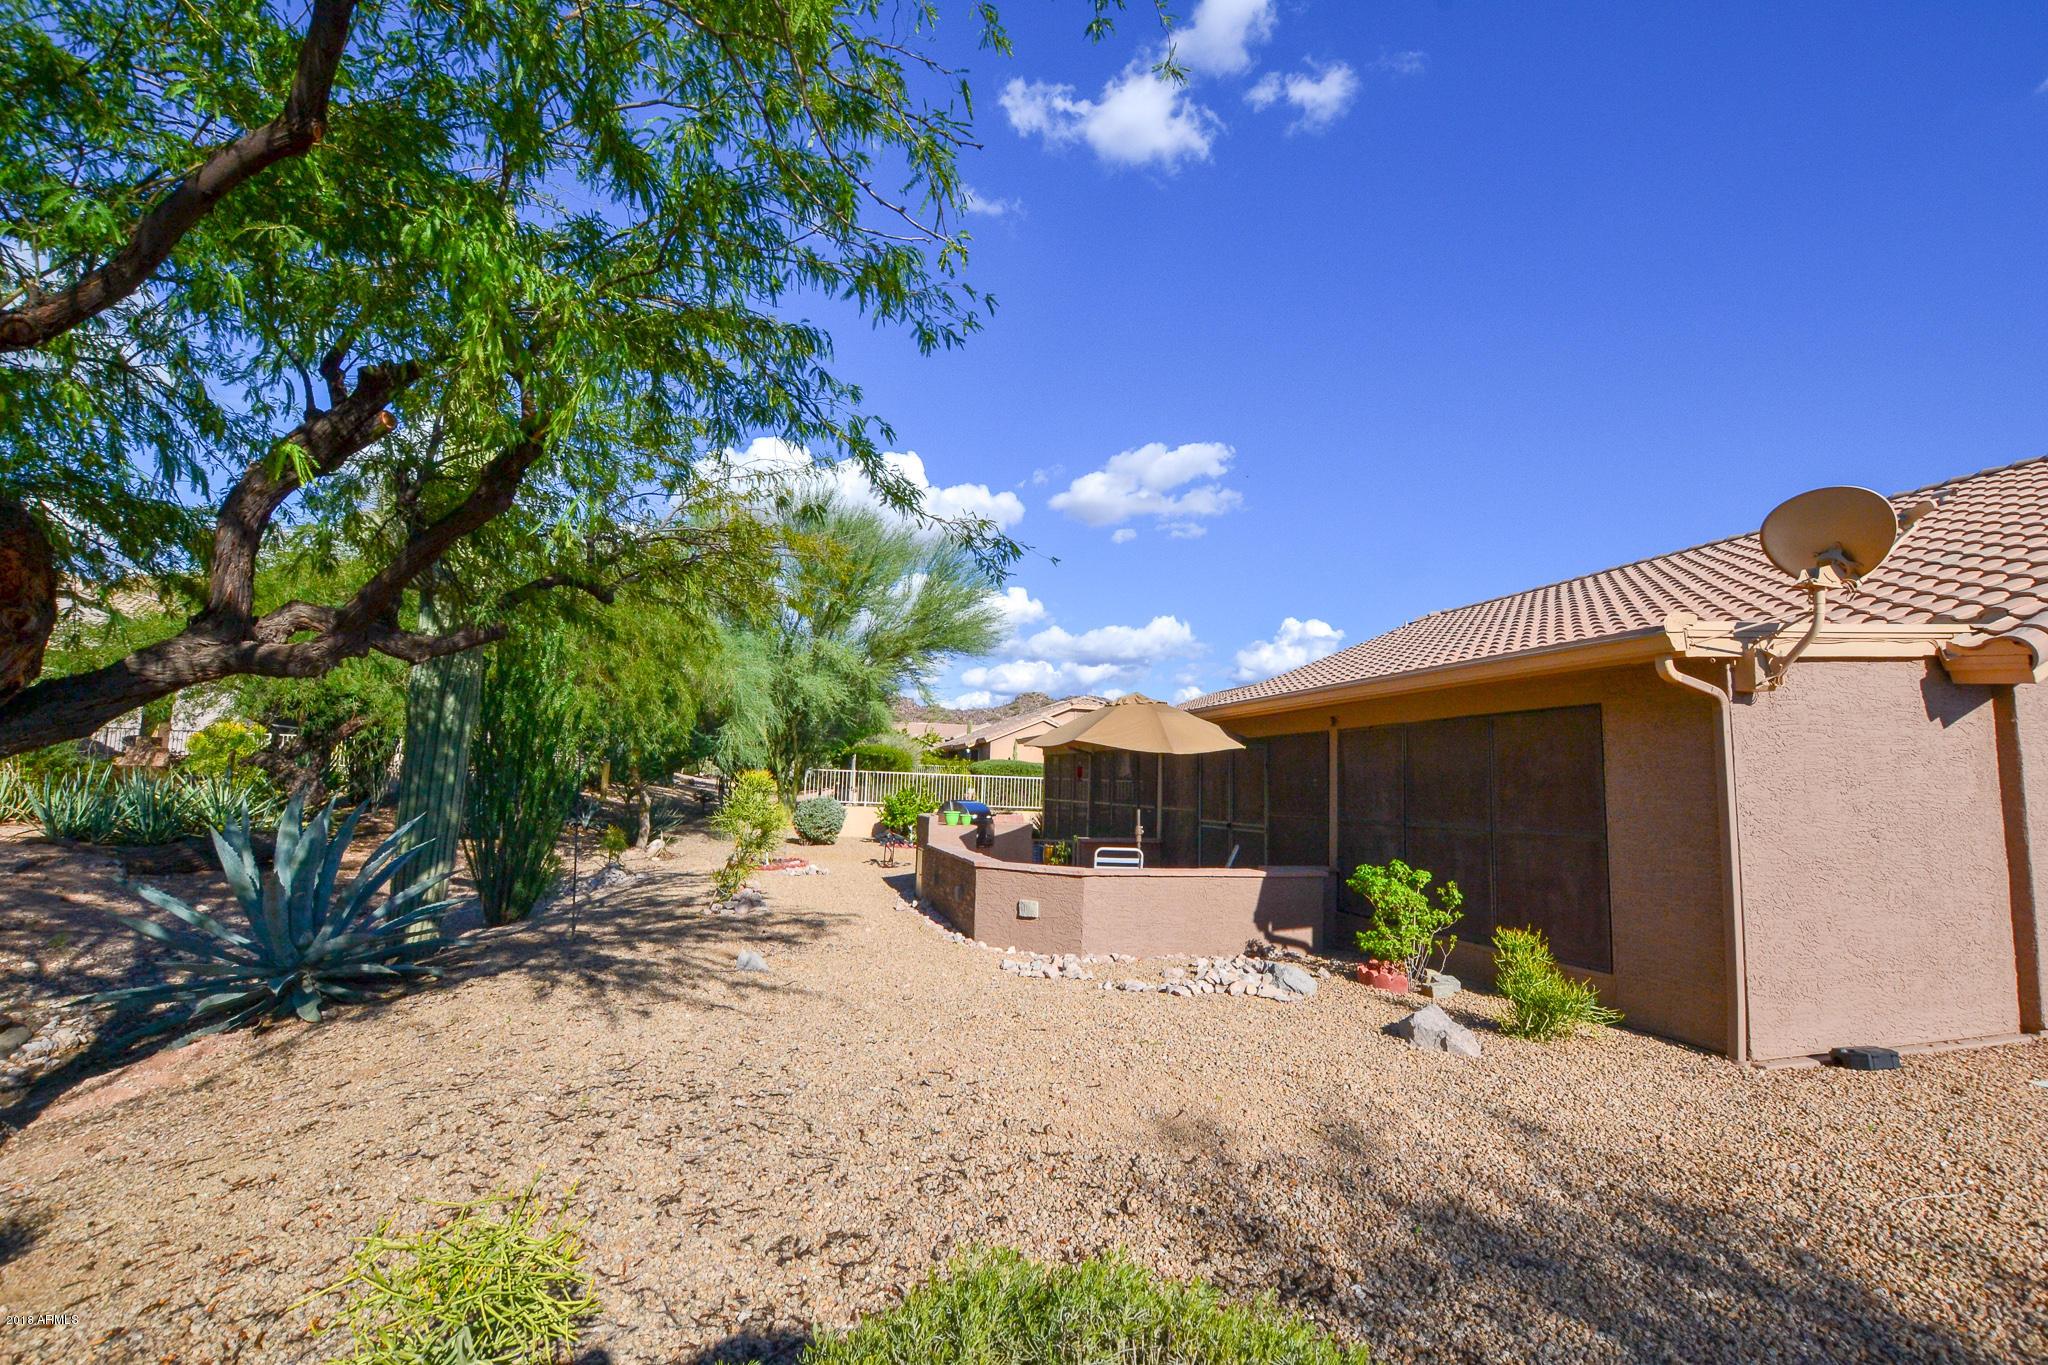 MLS 5831599 8956 E Saguaro Blossom Road, Gold Canyon, AZ 85118 Gold Canyon AZ Mountainbrook Village